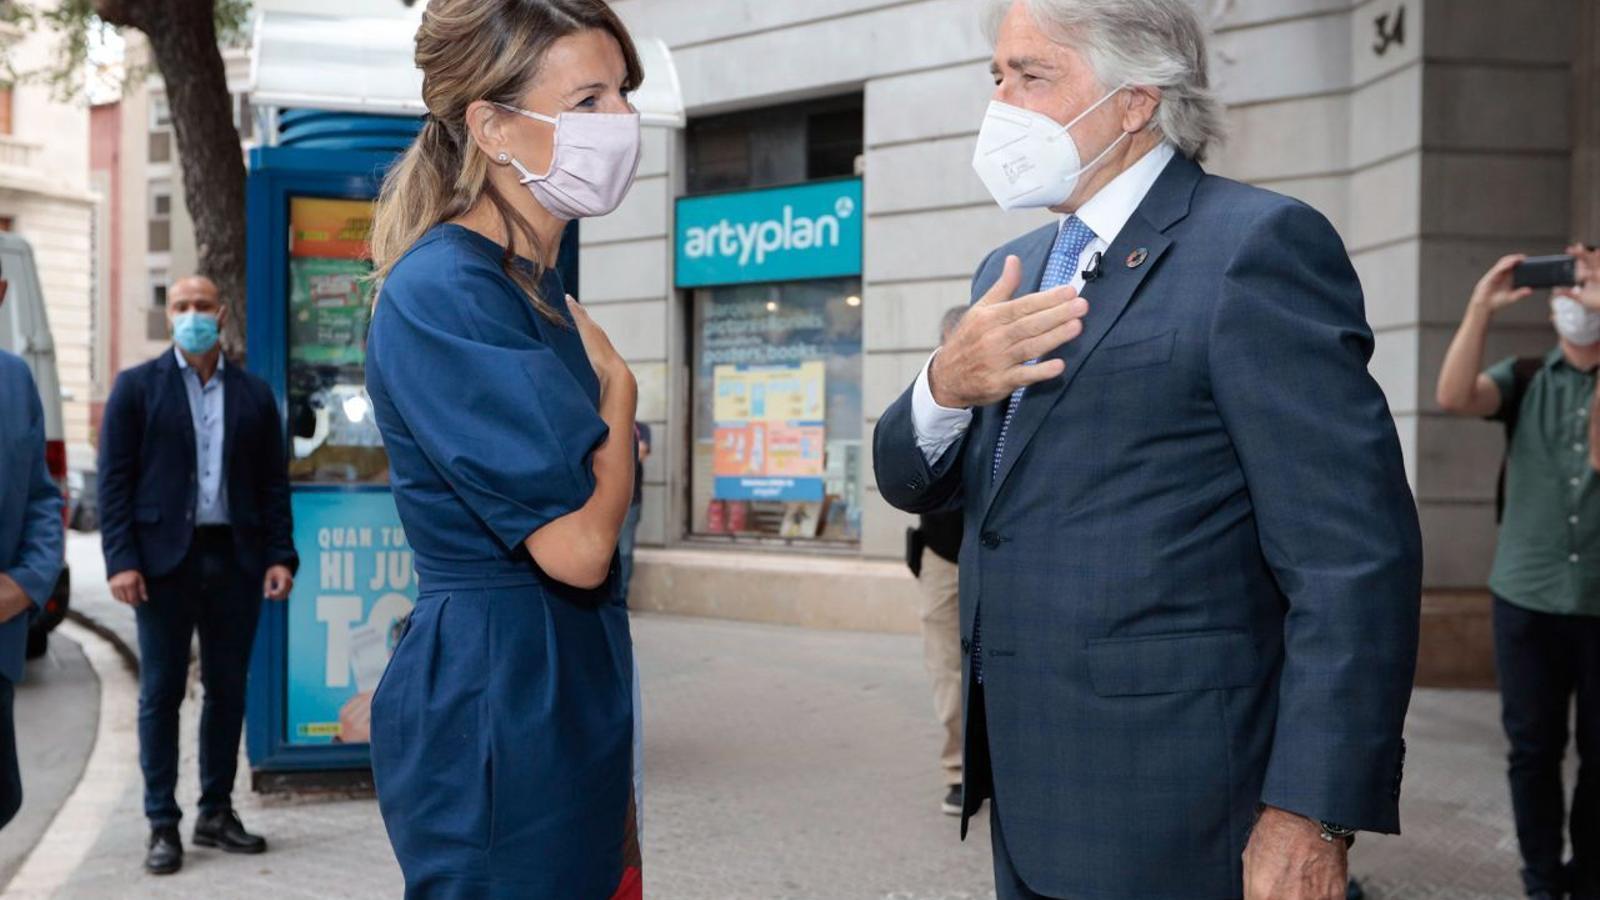 La ministra Yolanda Díaz i el president de Foment, Josep Sánchez Llibre, avui a Barcelona.